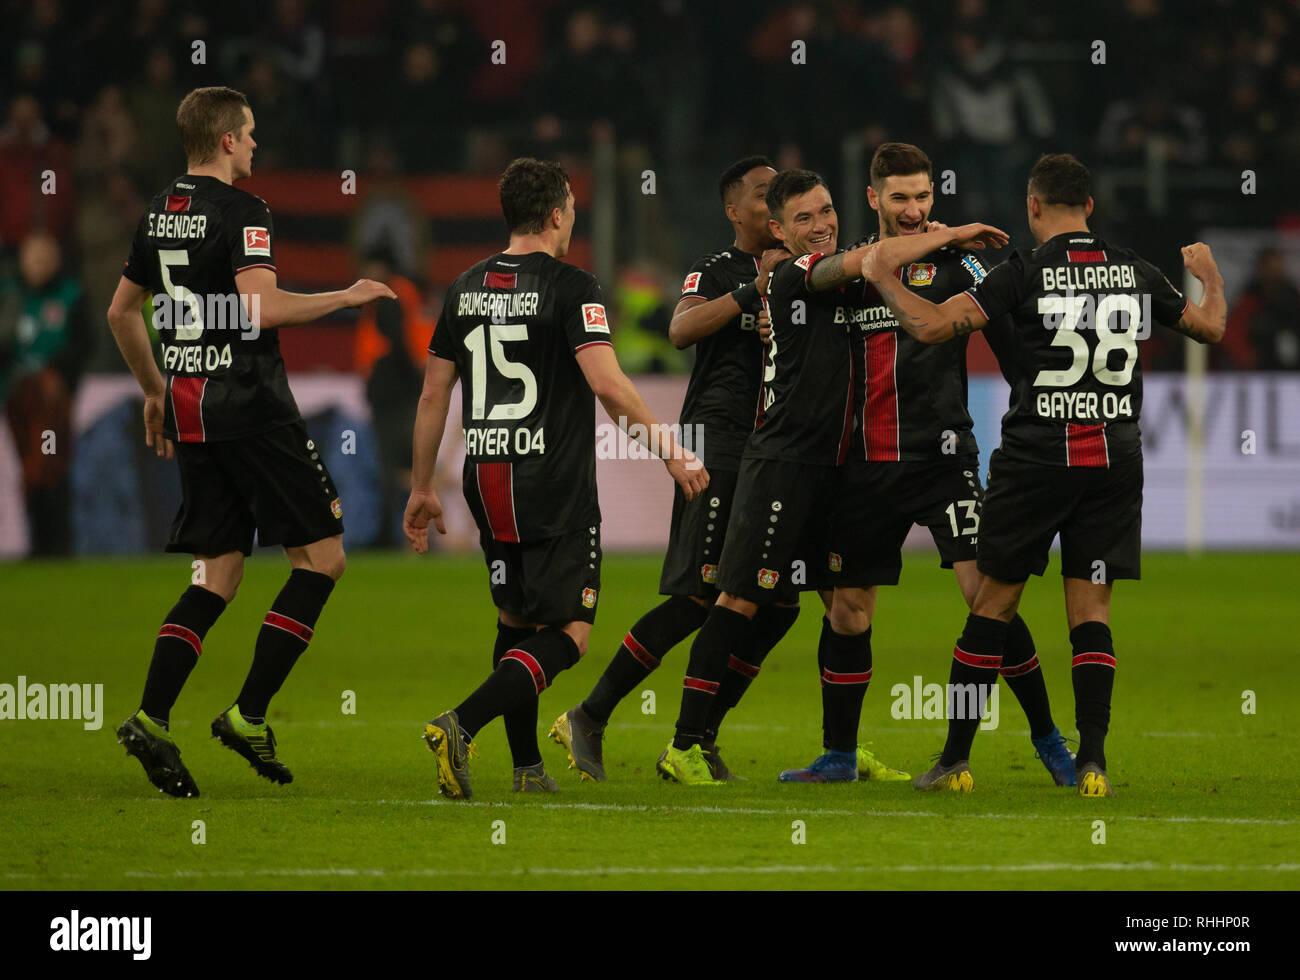 Leverkusen, Germany. 2nd Feb 2019.   Bundesliga, matchday 20, Bayer 04 Leverkusen vs FC Bayern Muenchen: Torjubel 3-1 um ucas Alario (B04)                  Credit: Juergen Schwarz/Alamy Live News - Stock Image